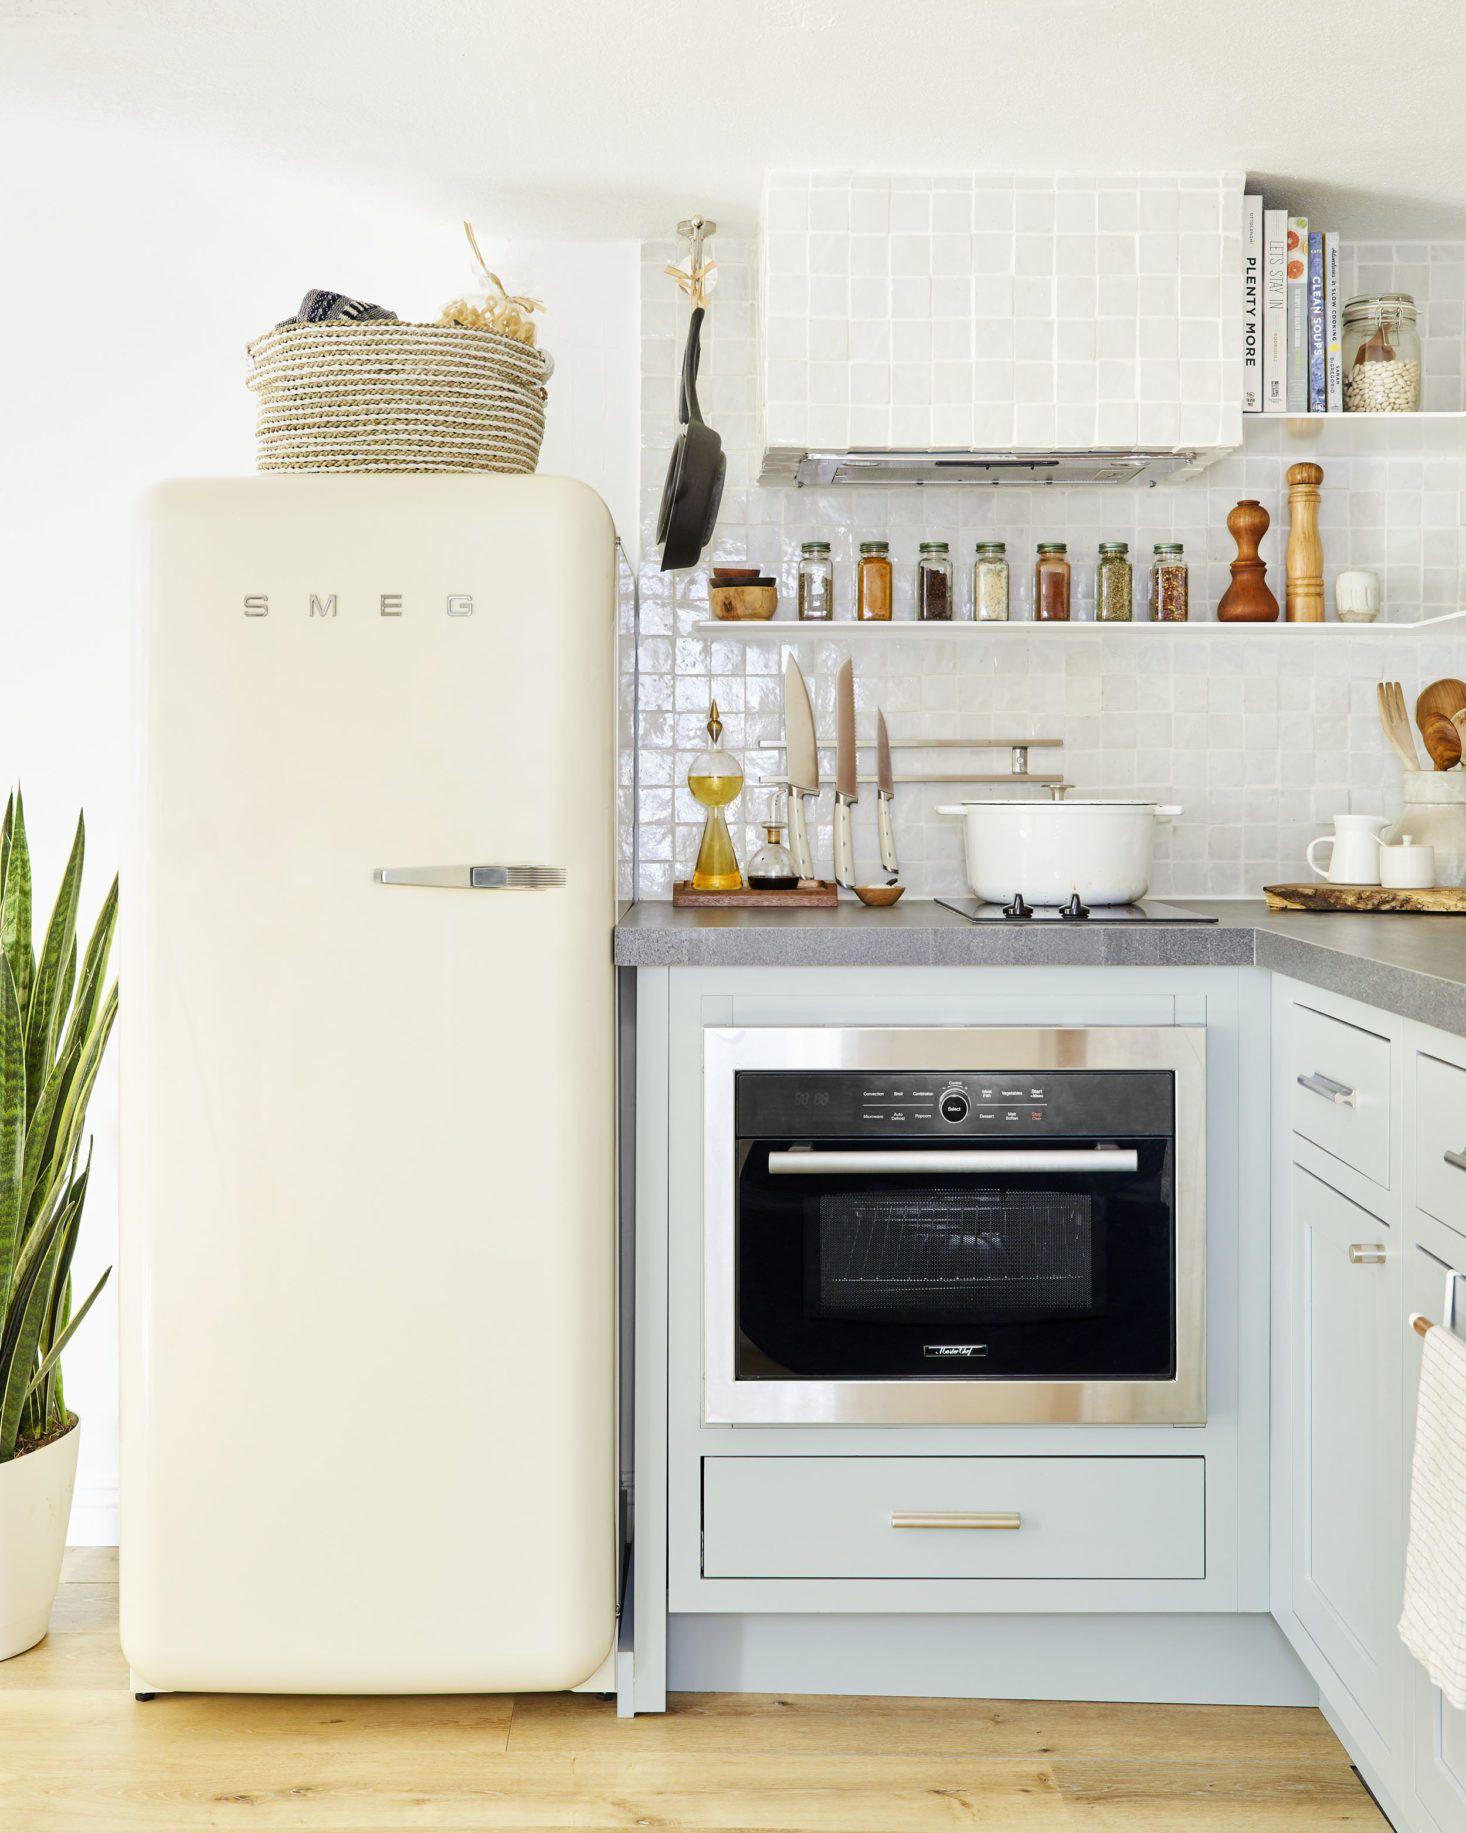 Supersized Storage In A Tiny Kitchen 7 Game Changing Aha Hacks Tiny Kitchen Easy Kitchen Upgrade Kitchen Upgrades